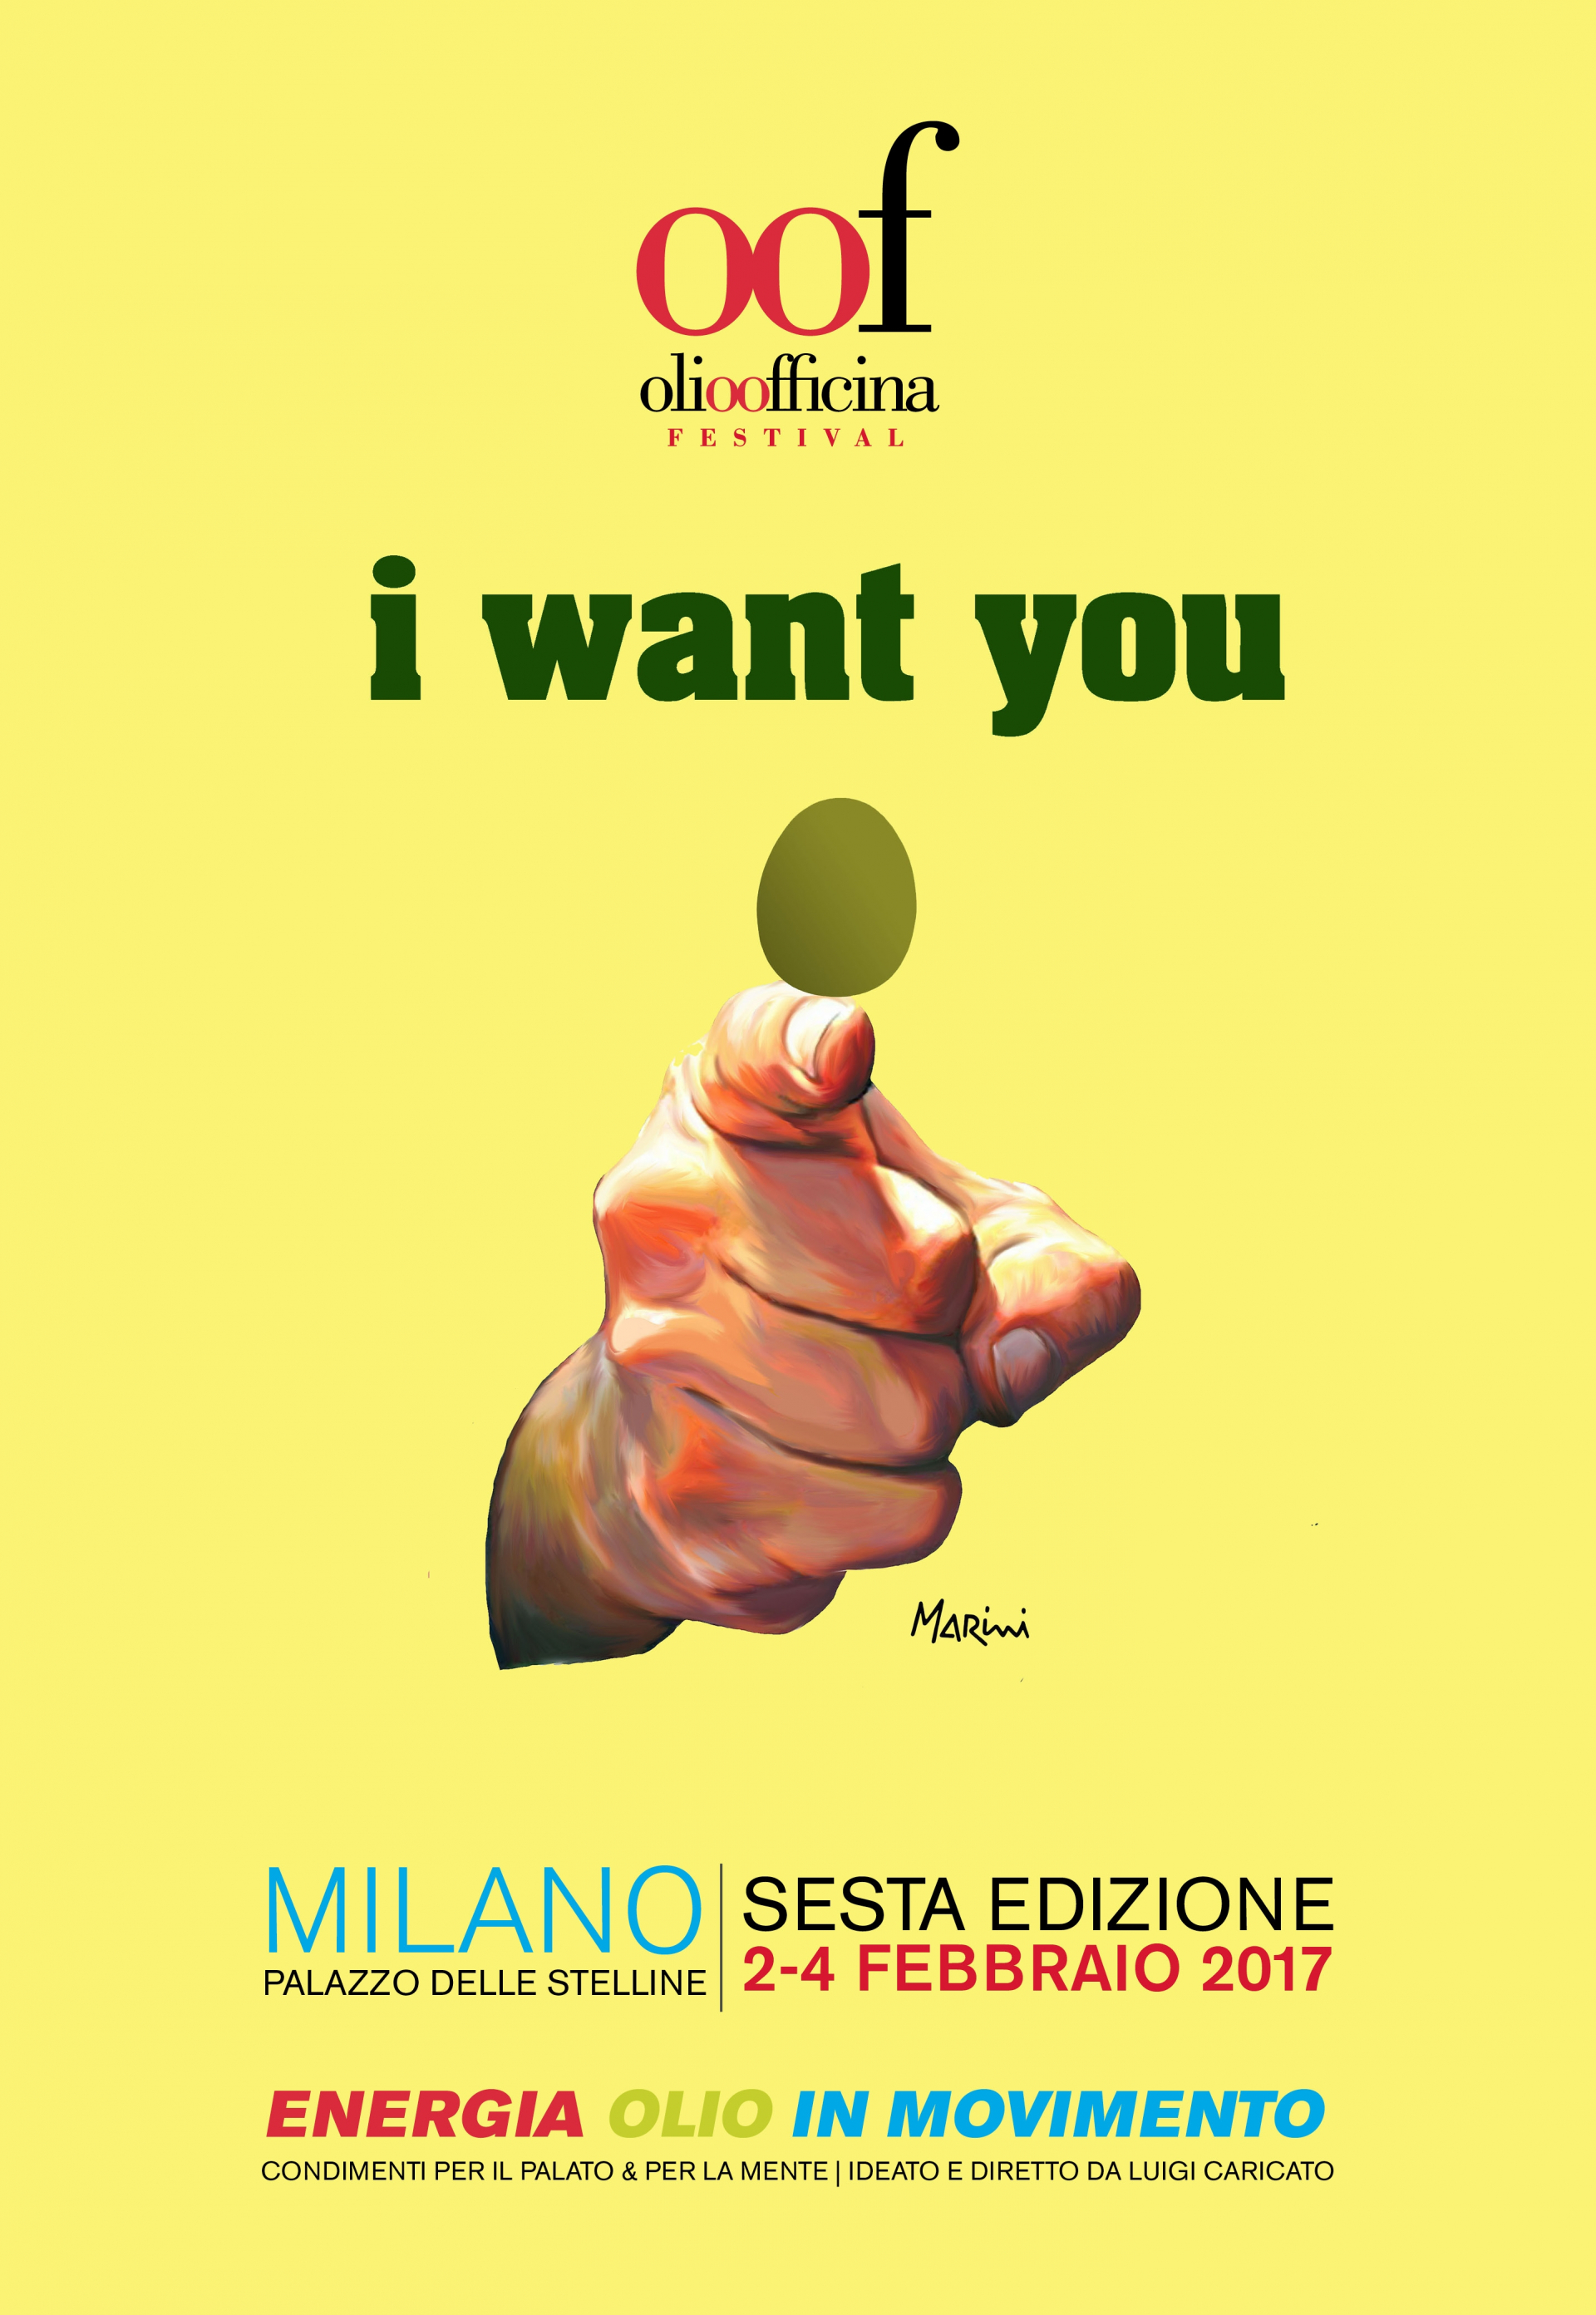 Olio Officina festival: I want you